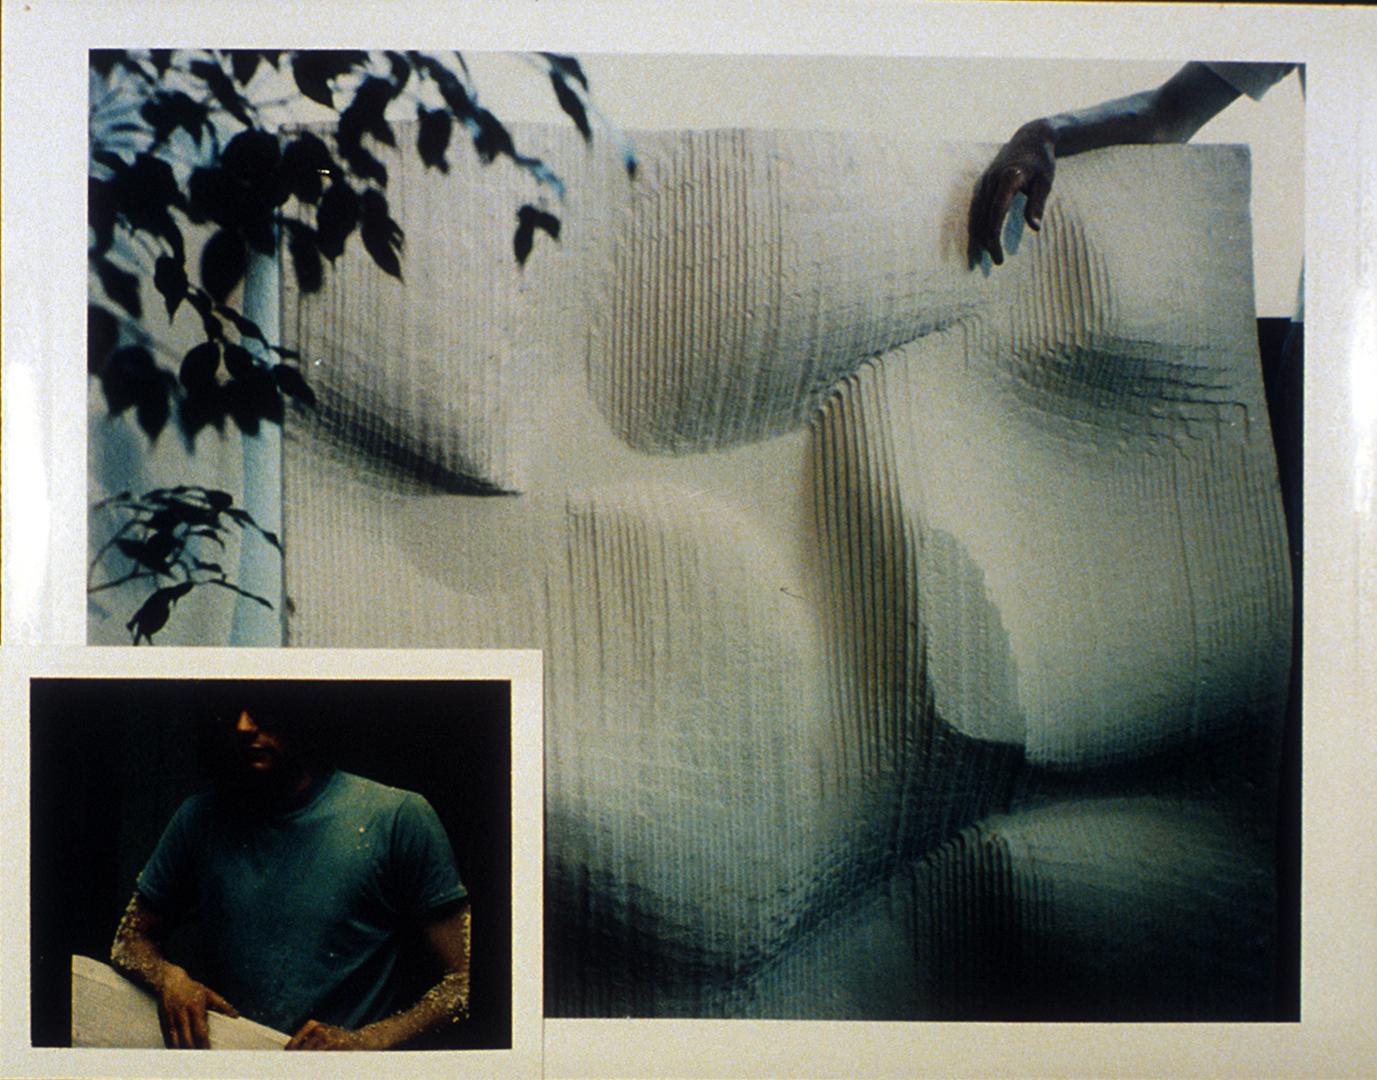 ©1982, Rob Faught, Fragment